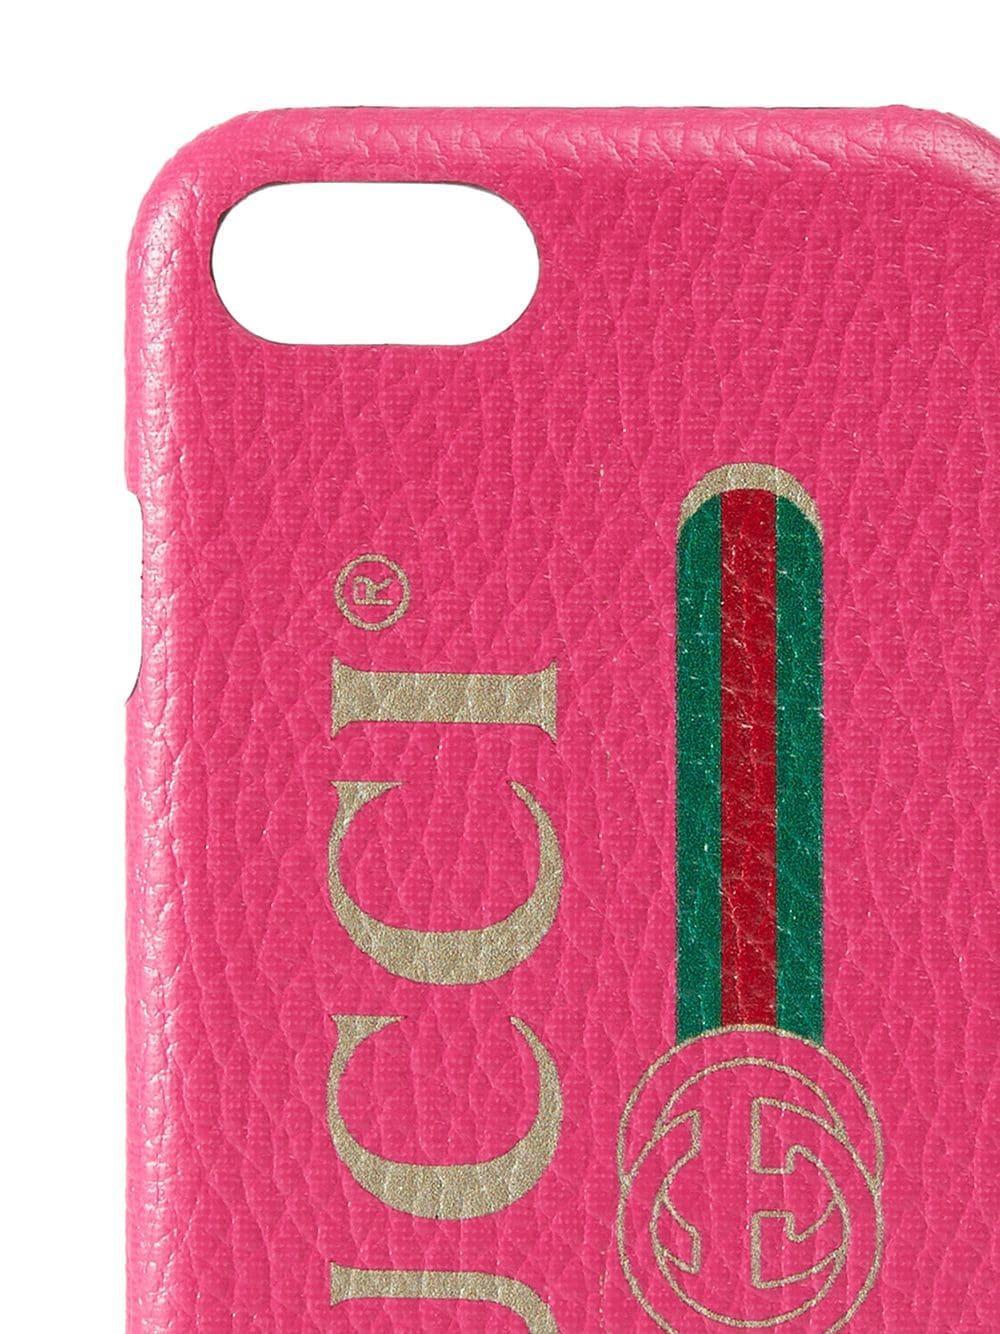 cea2d07901d Funda para iphone 8 con print - rosa